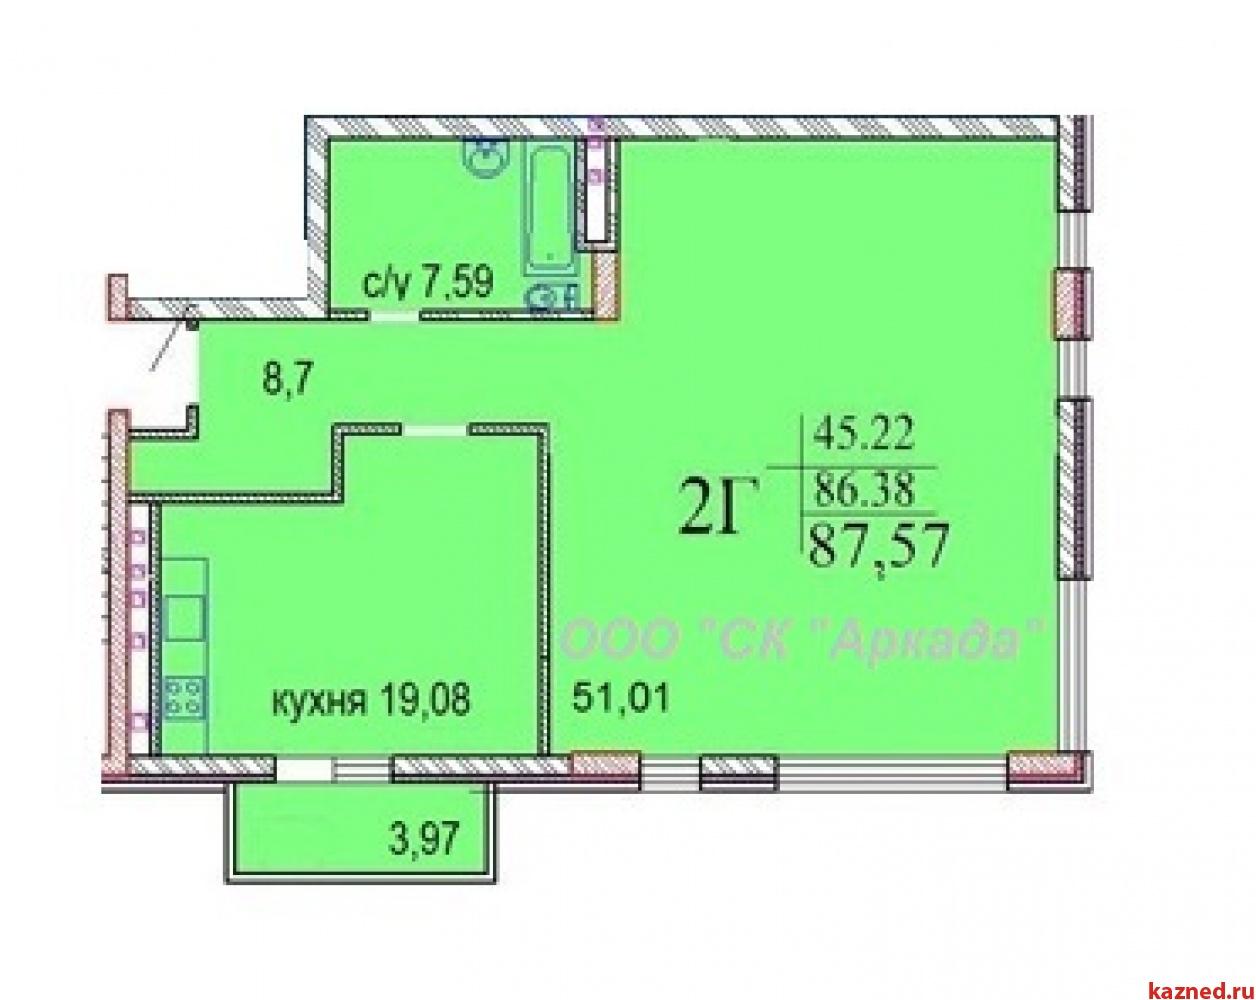 Продажа 3-к квартиры Шуртыгина, д. 7, 88 м2  (миниатюра №2)